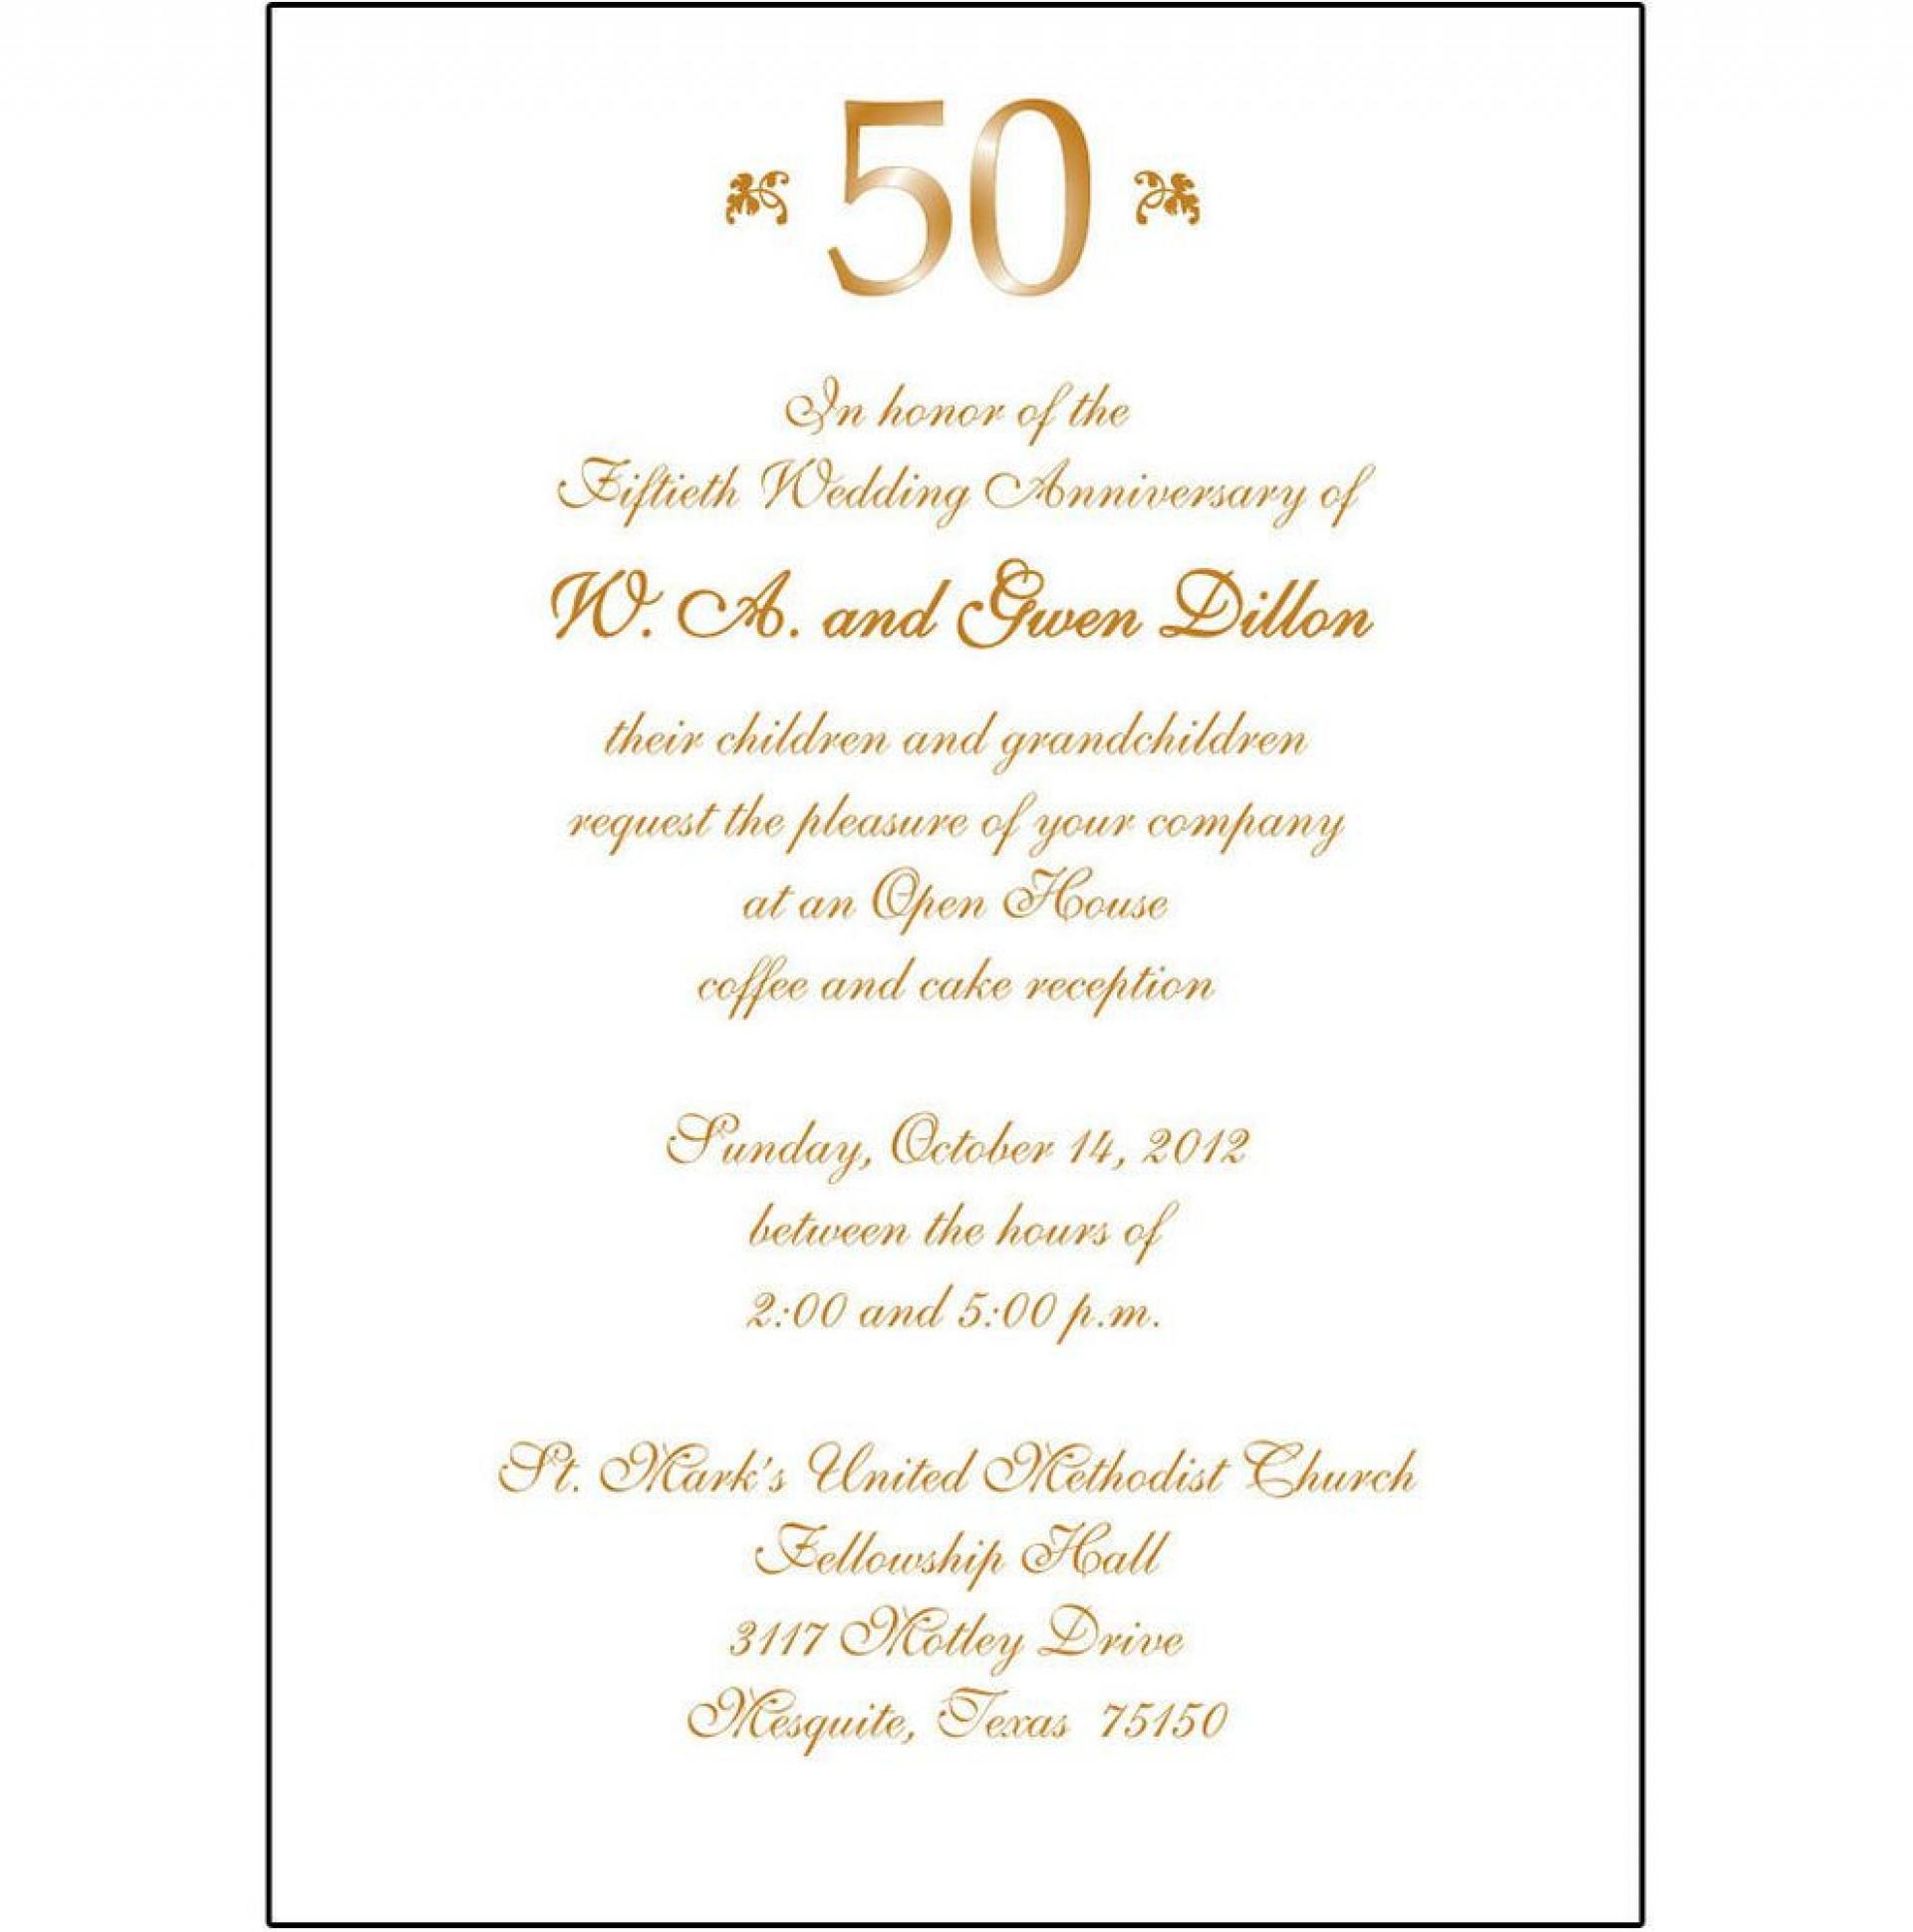 008 Staggering 50th Wedding Anniversary Invitation Card Sample High Definition  Wording1920